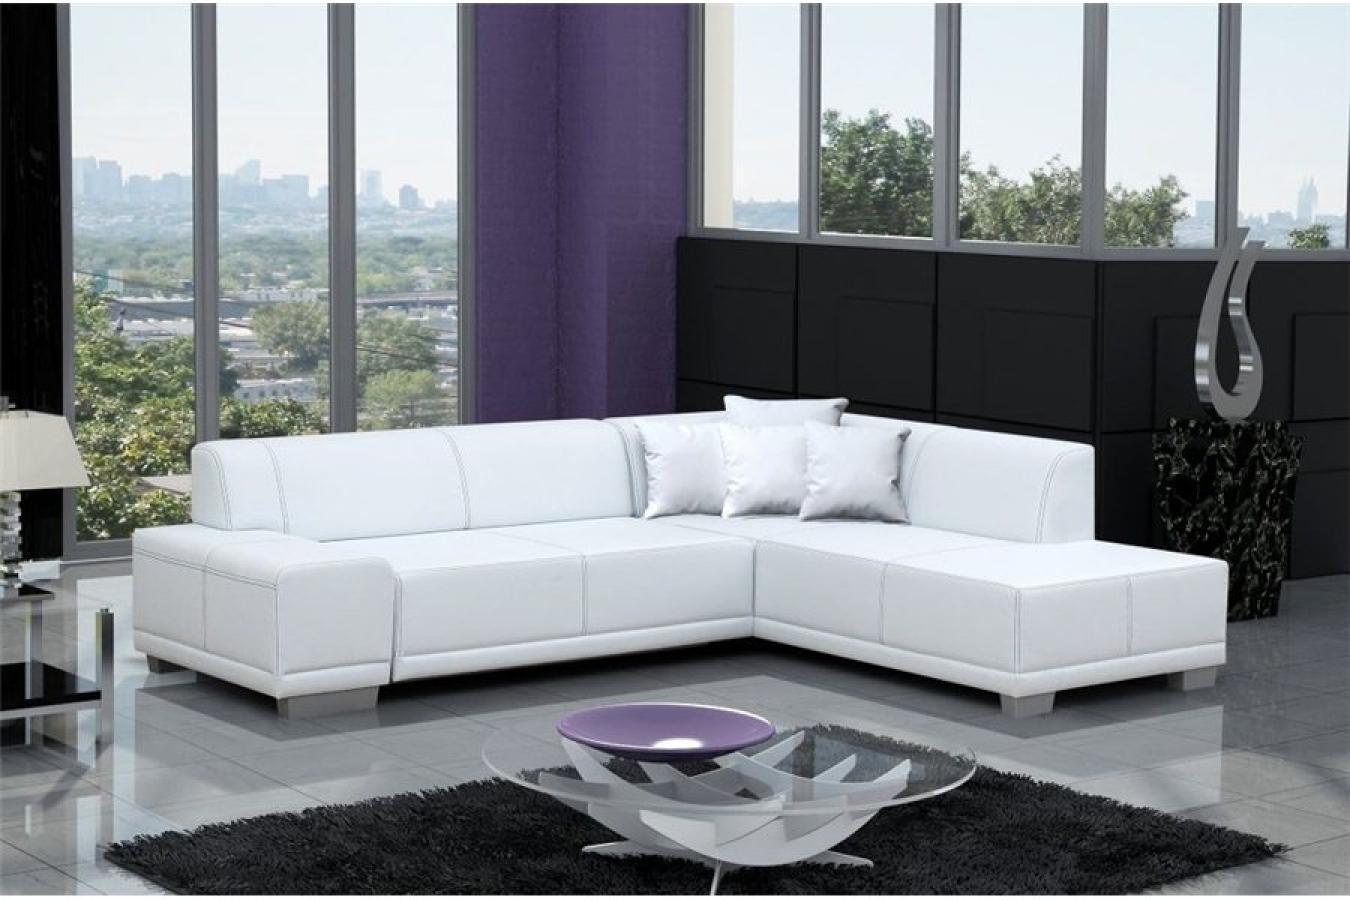 photos canap blanc moderne. Black Bedroom Furniture Sets. Home Design Ideas